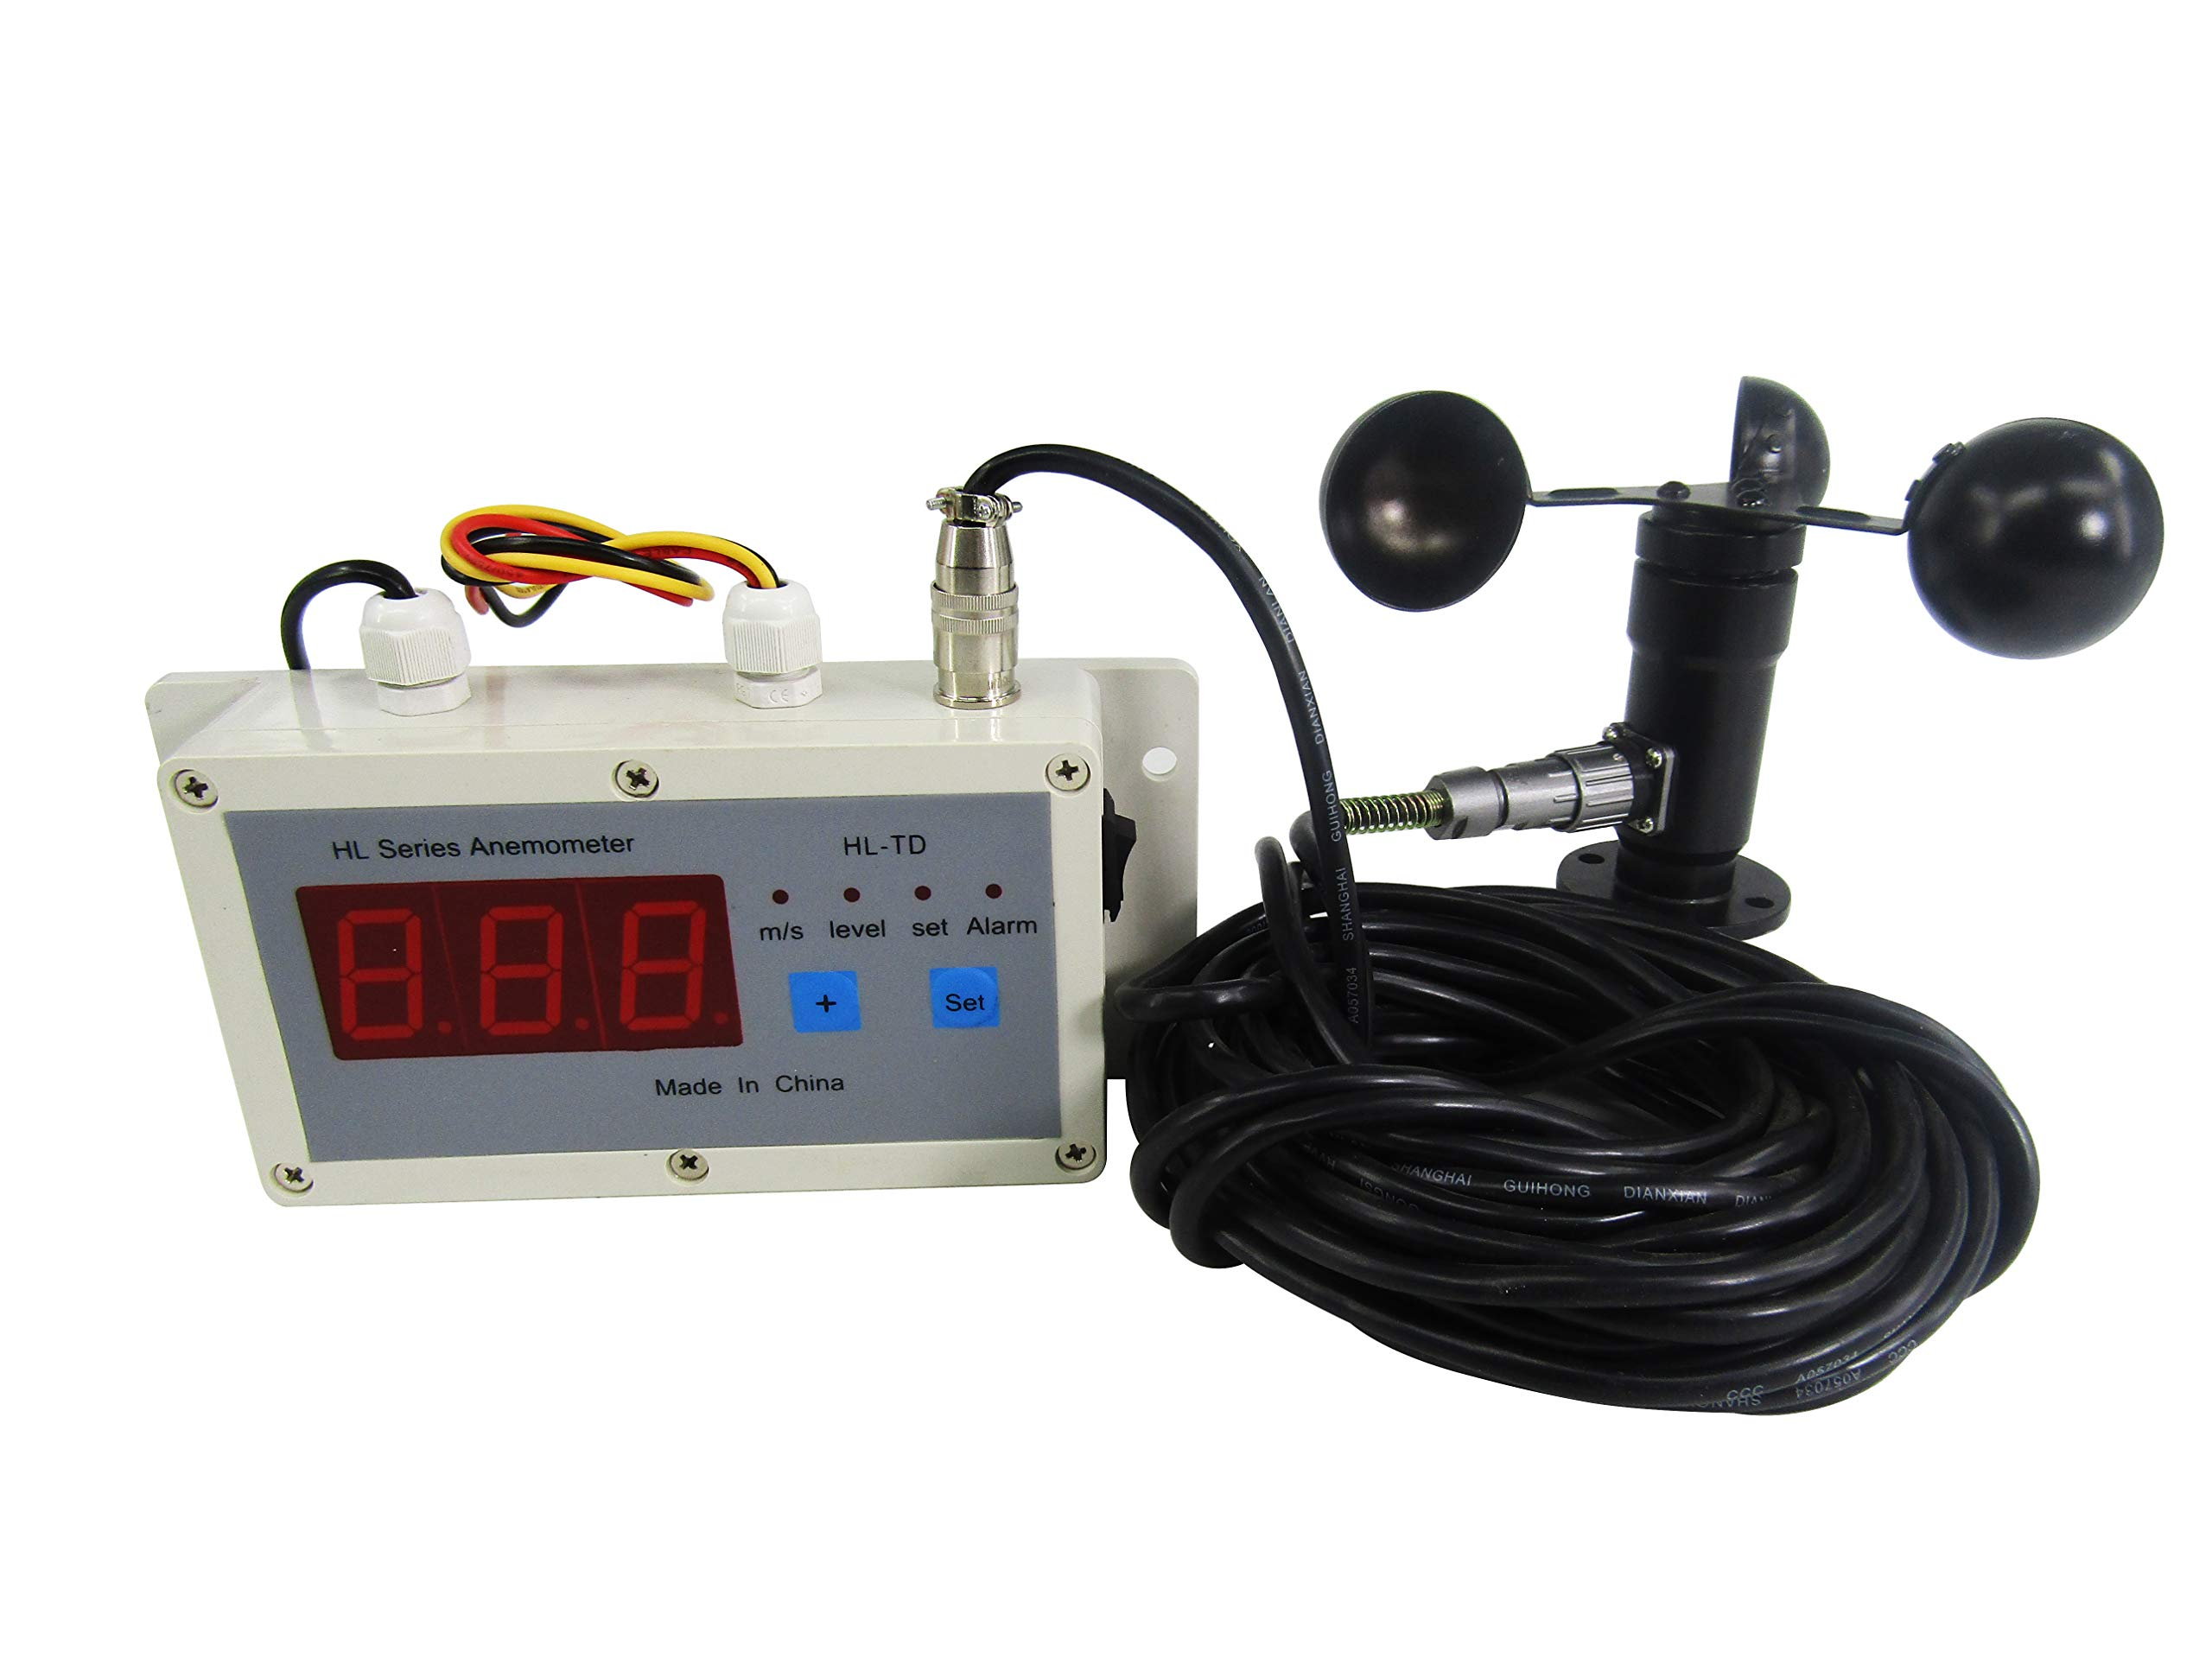 KUNHEWUHUA Wind Speed Alarm Device Anemometer Wind Speed Measurement & Control Instrument Gantry Crane Dedicated Anemometer Digital Display 110V by KUNHEWUHUA (Image #3)